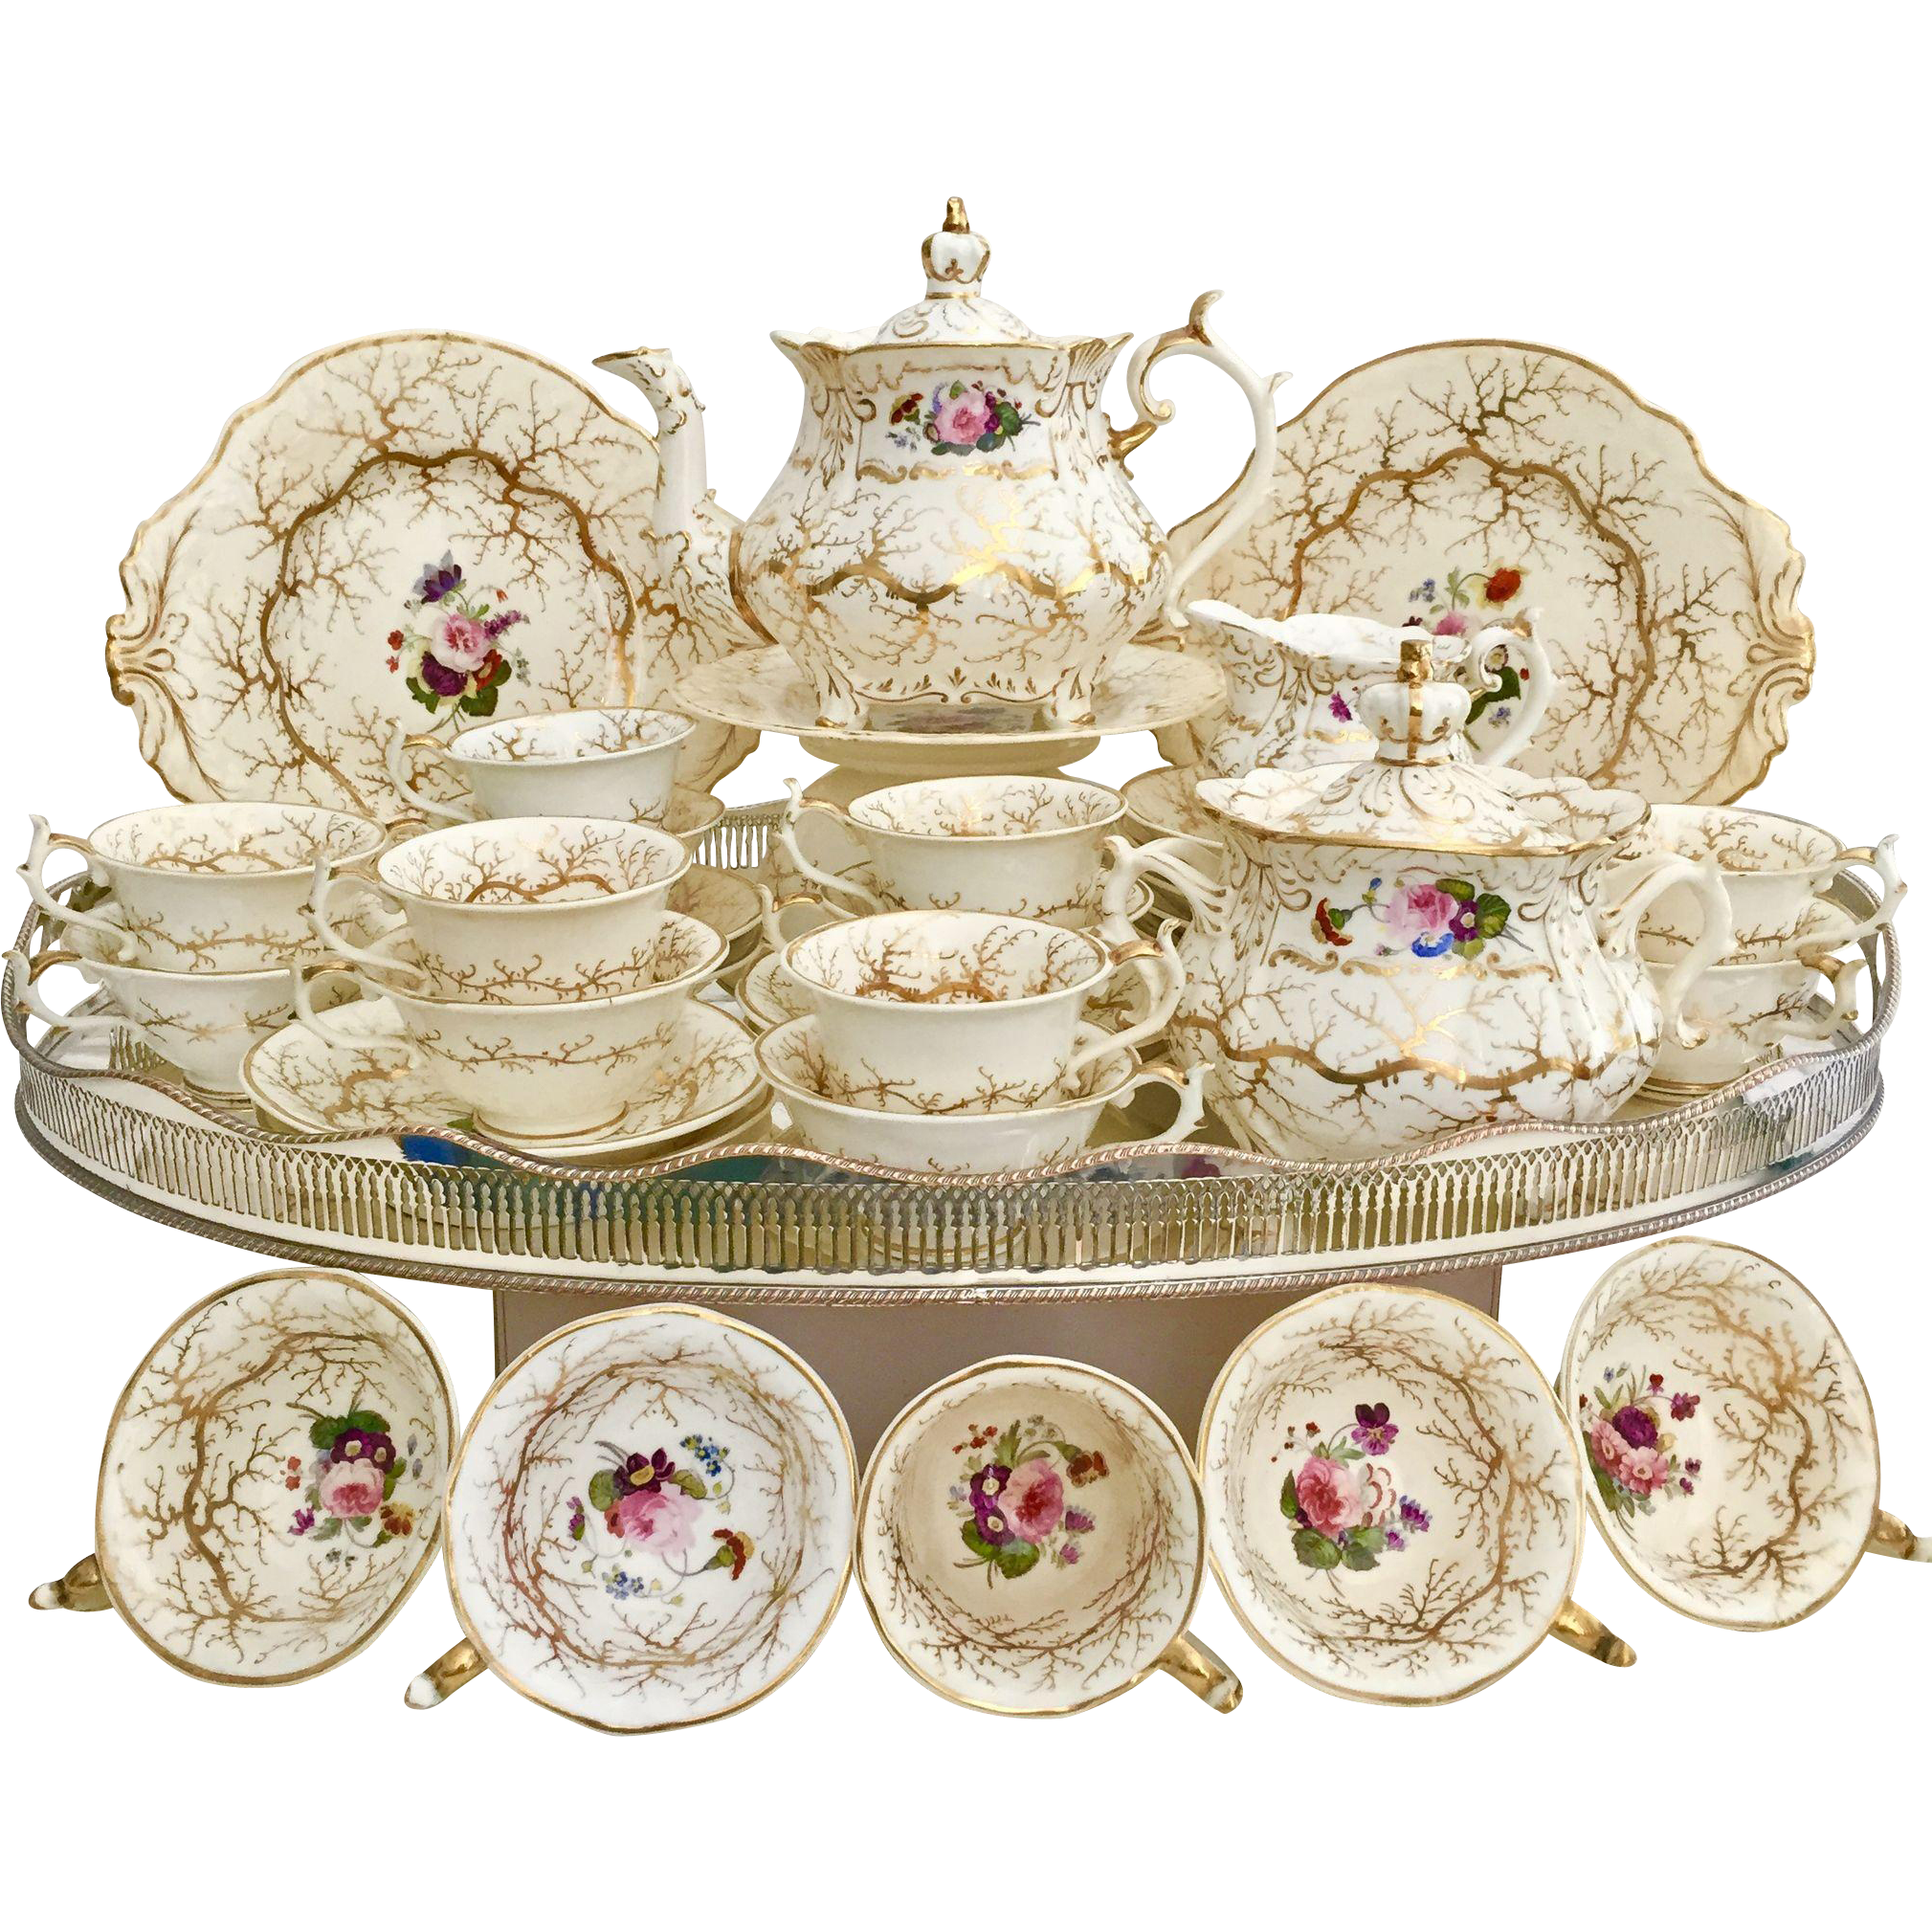 Rockingham Full Tea Service, Rococo Patt. 1373 Seaweed And